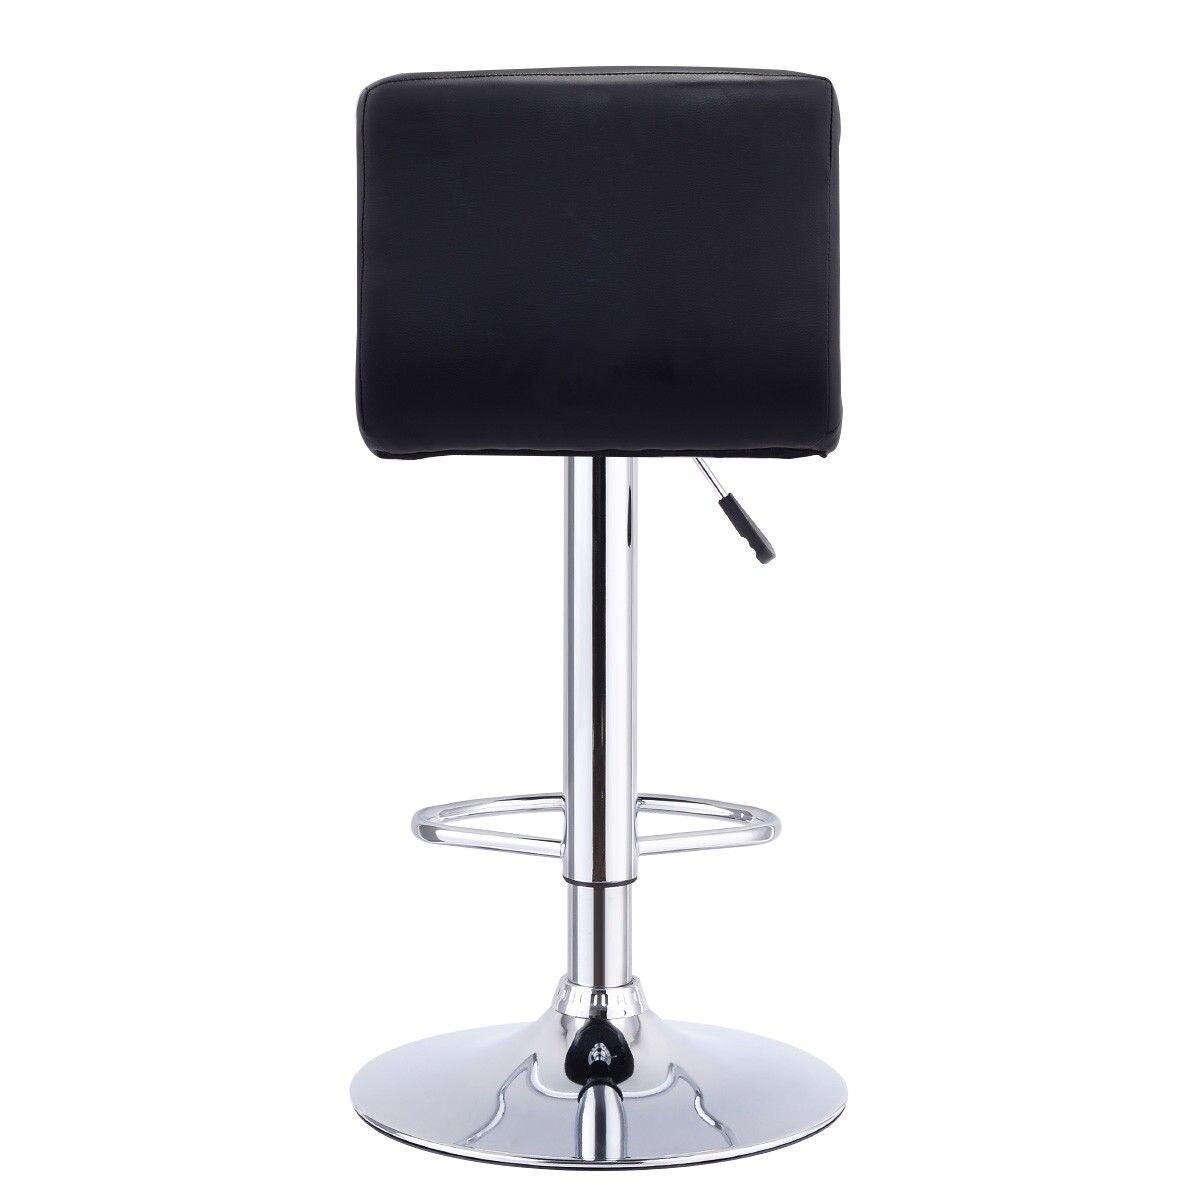 Giantex Bar Stool Swivel Adjustable PU Leather Barstools Bistro Pub Chair  Modern Living Room Bar Furniture HW53843BK In Bar Stools From Furniture On  ...